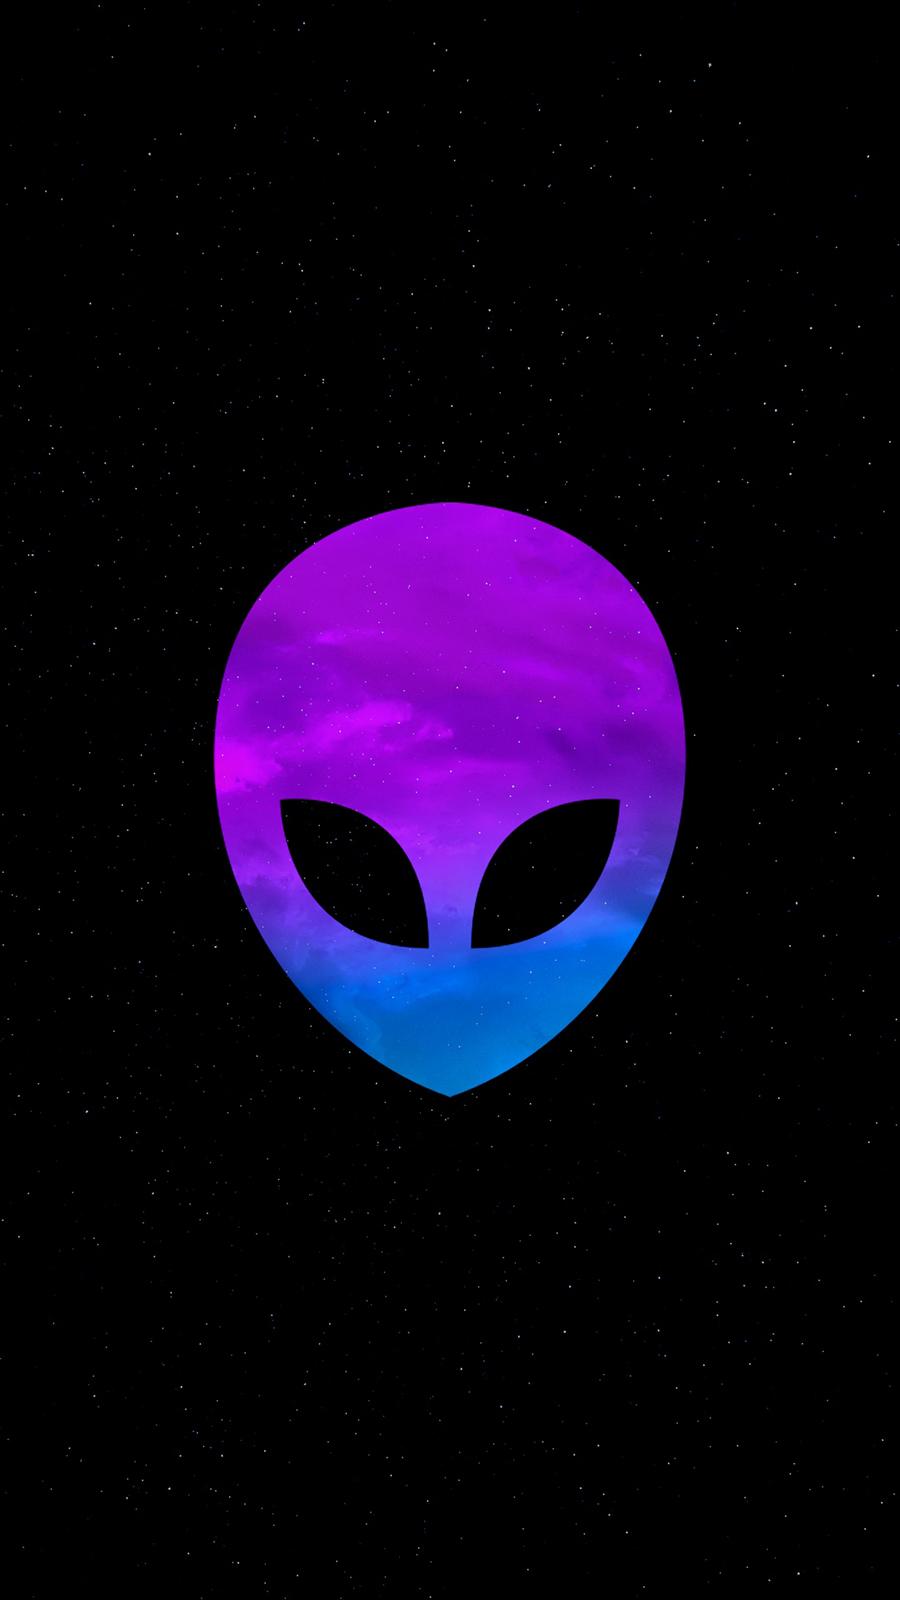 Alien Head Wallpapers Free Download